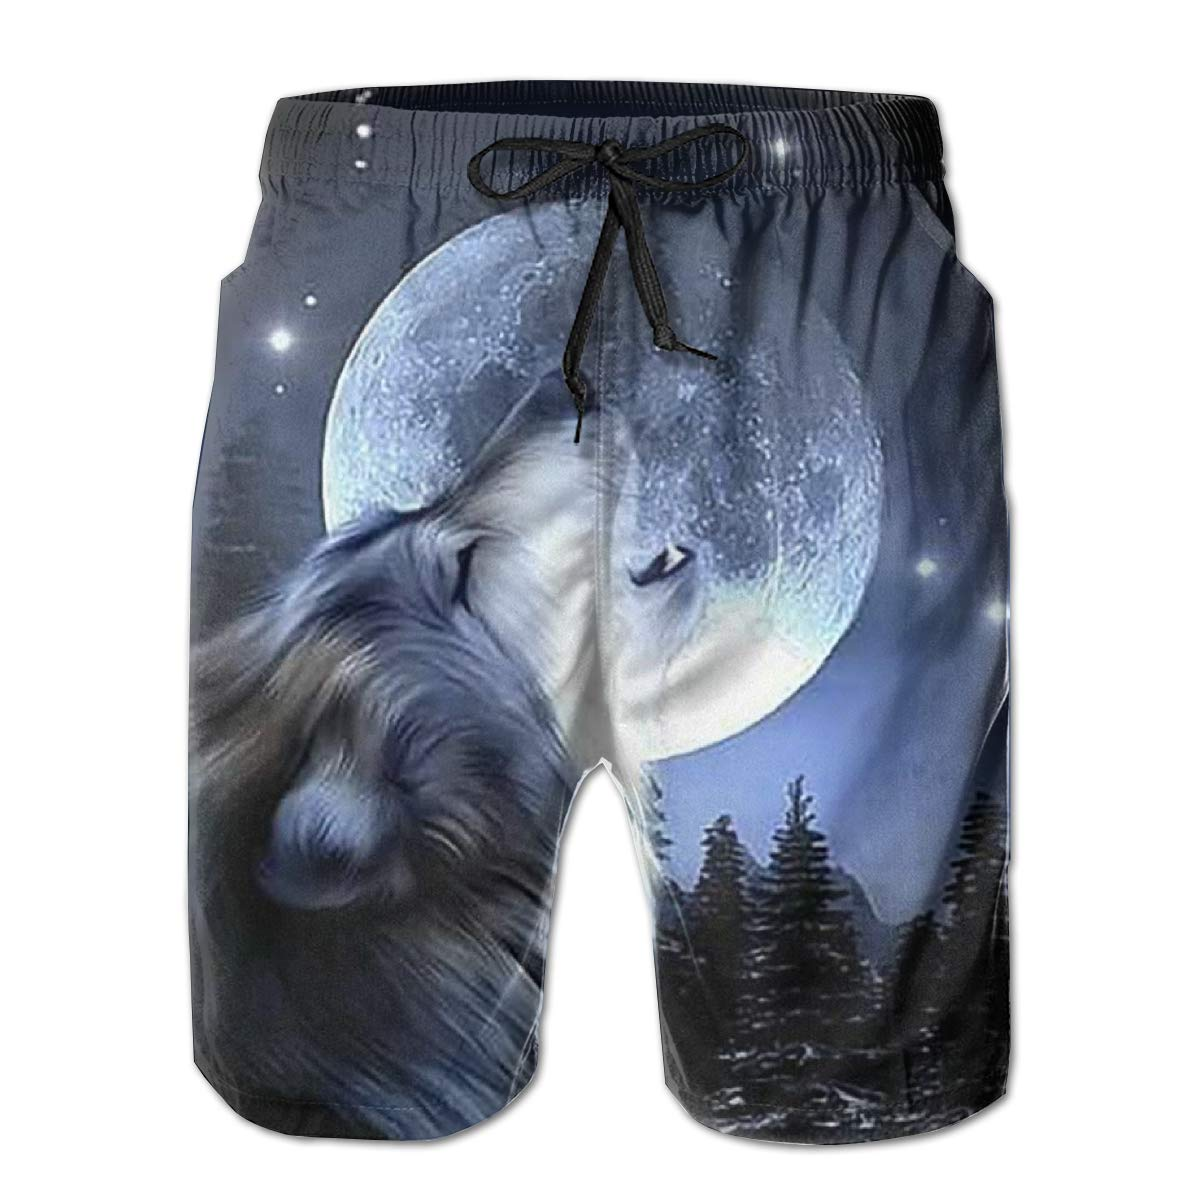 Oiyucv Mens Swim Trunks Wolf Moon Quick Dry Board Shorts Bathing Suits Swimwear Volley Beach Trunks